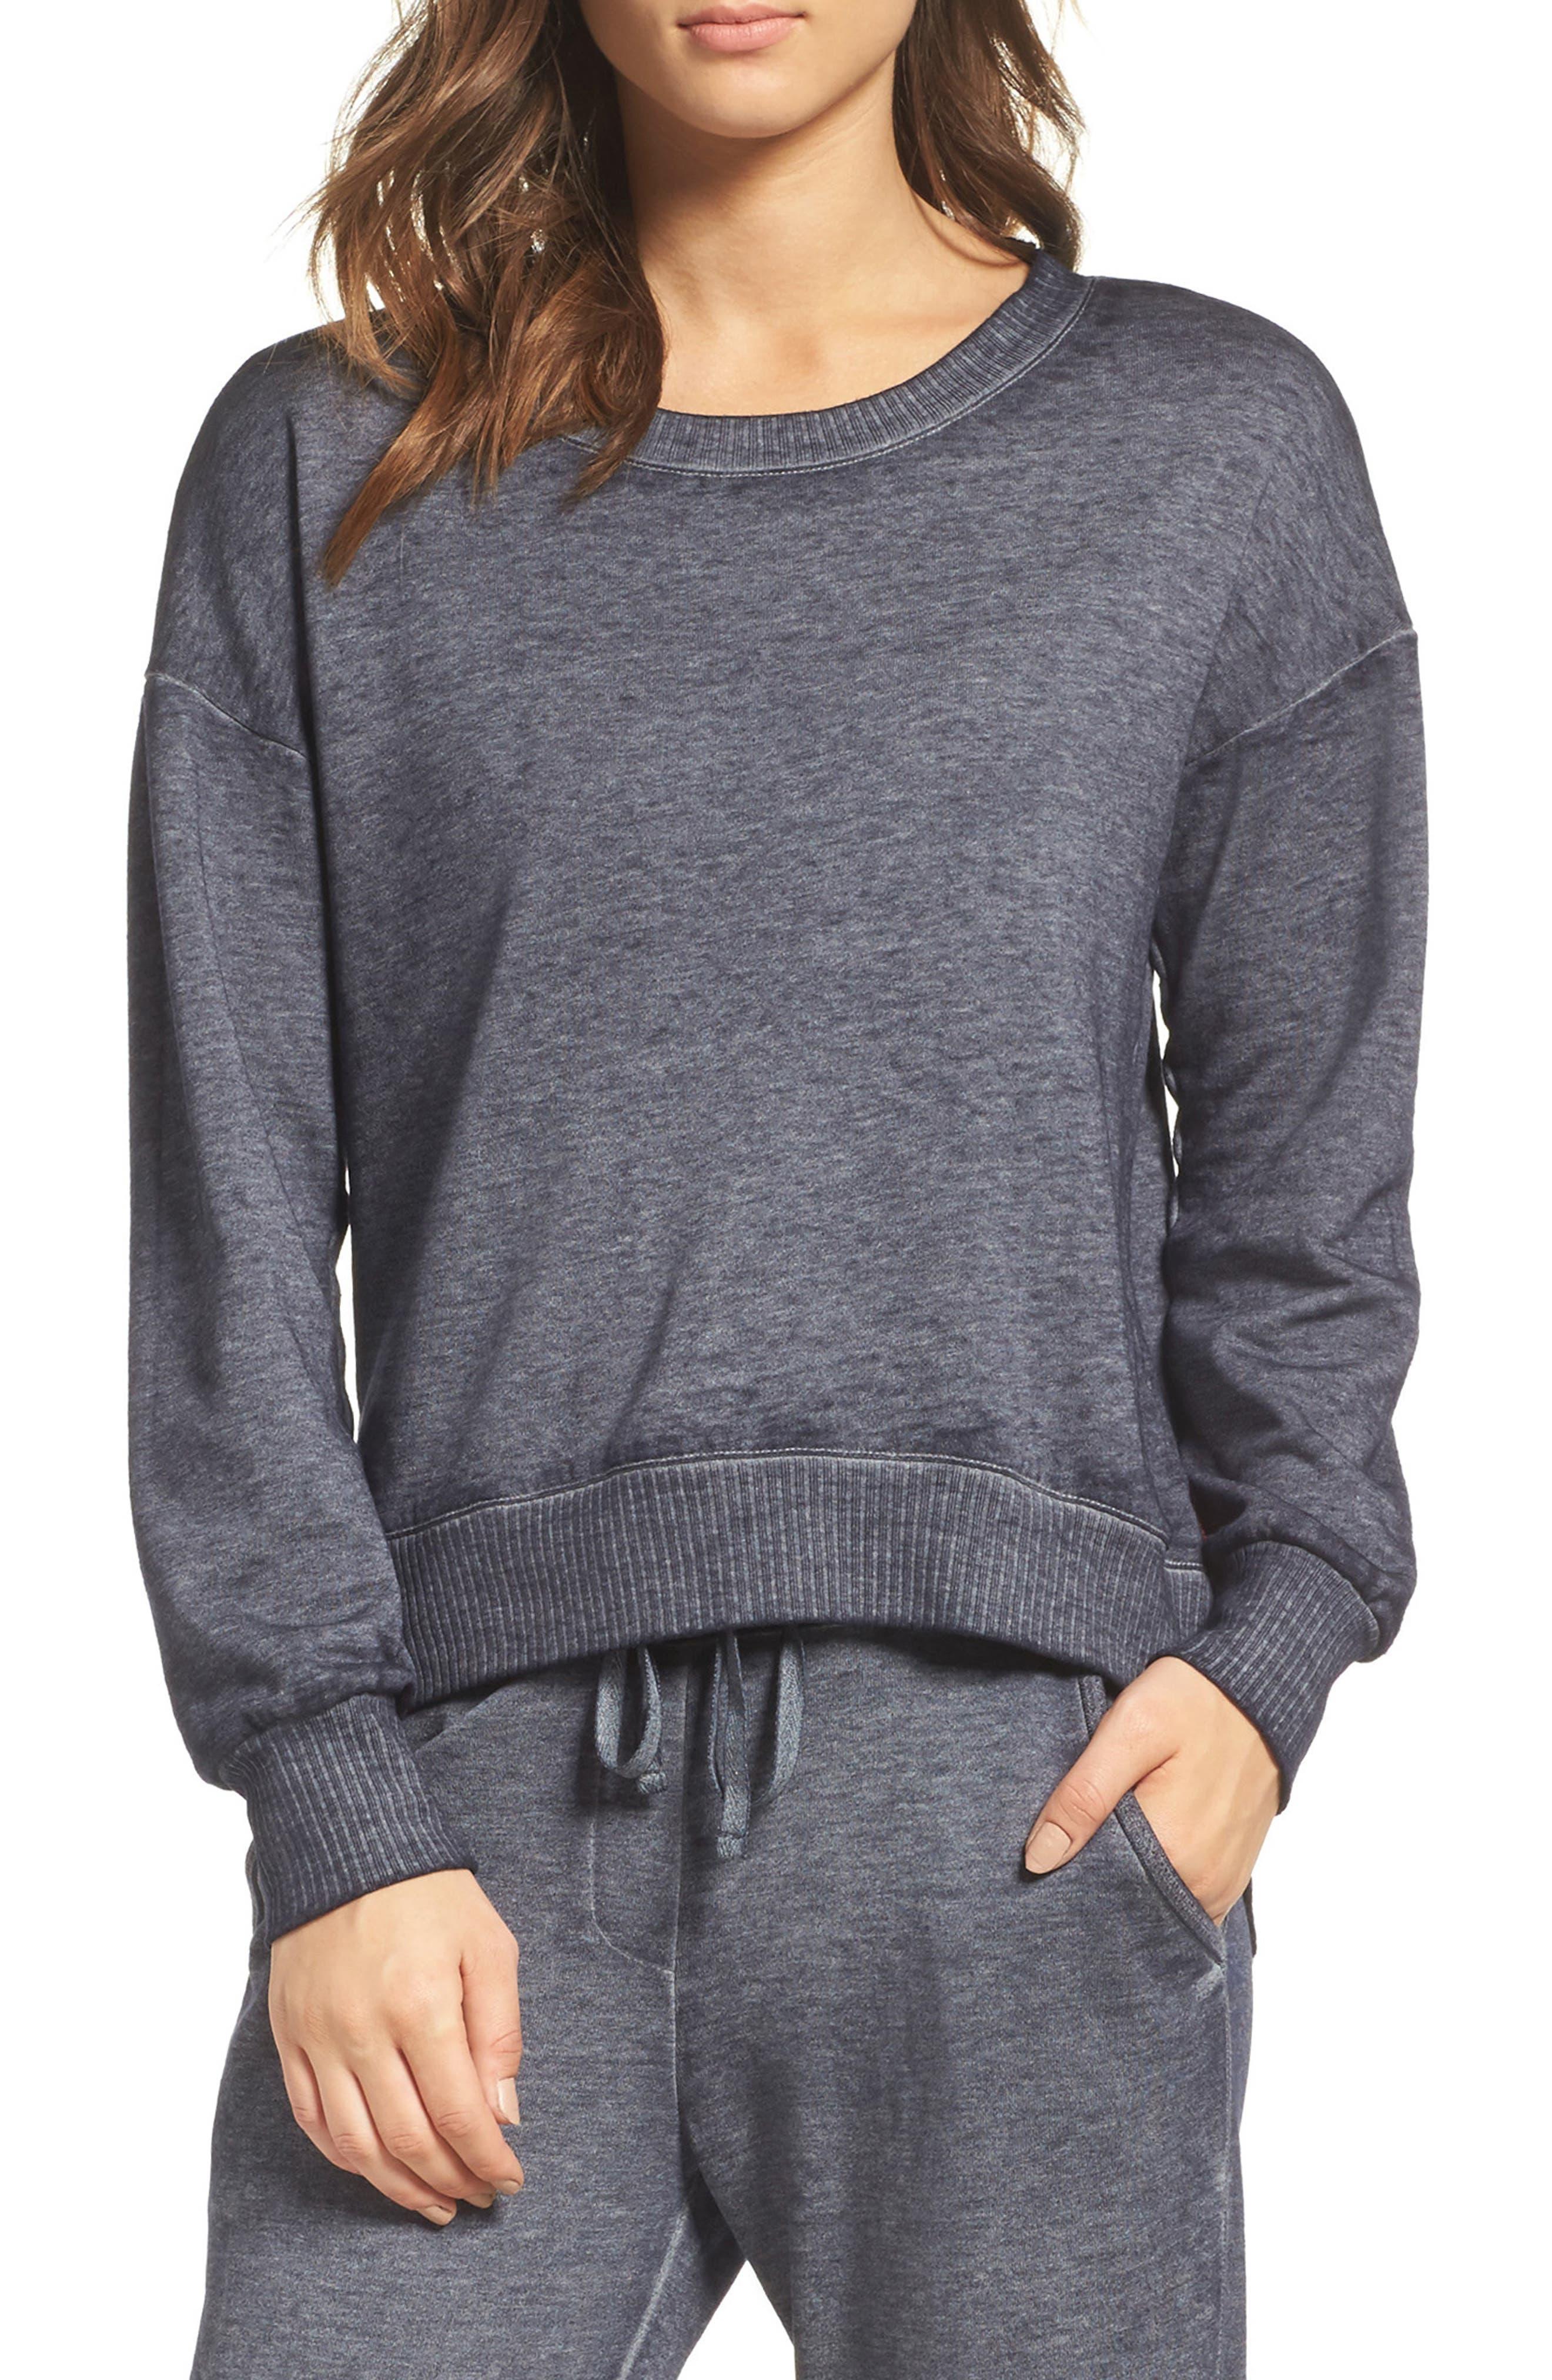 Sunset Blvd Pullover Sweatshirt,                         Main,                         color, Midnight Navy